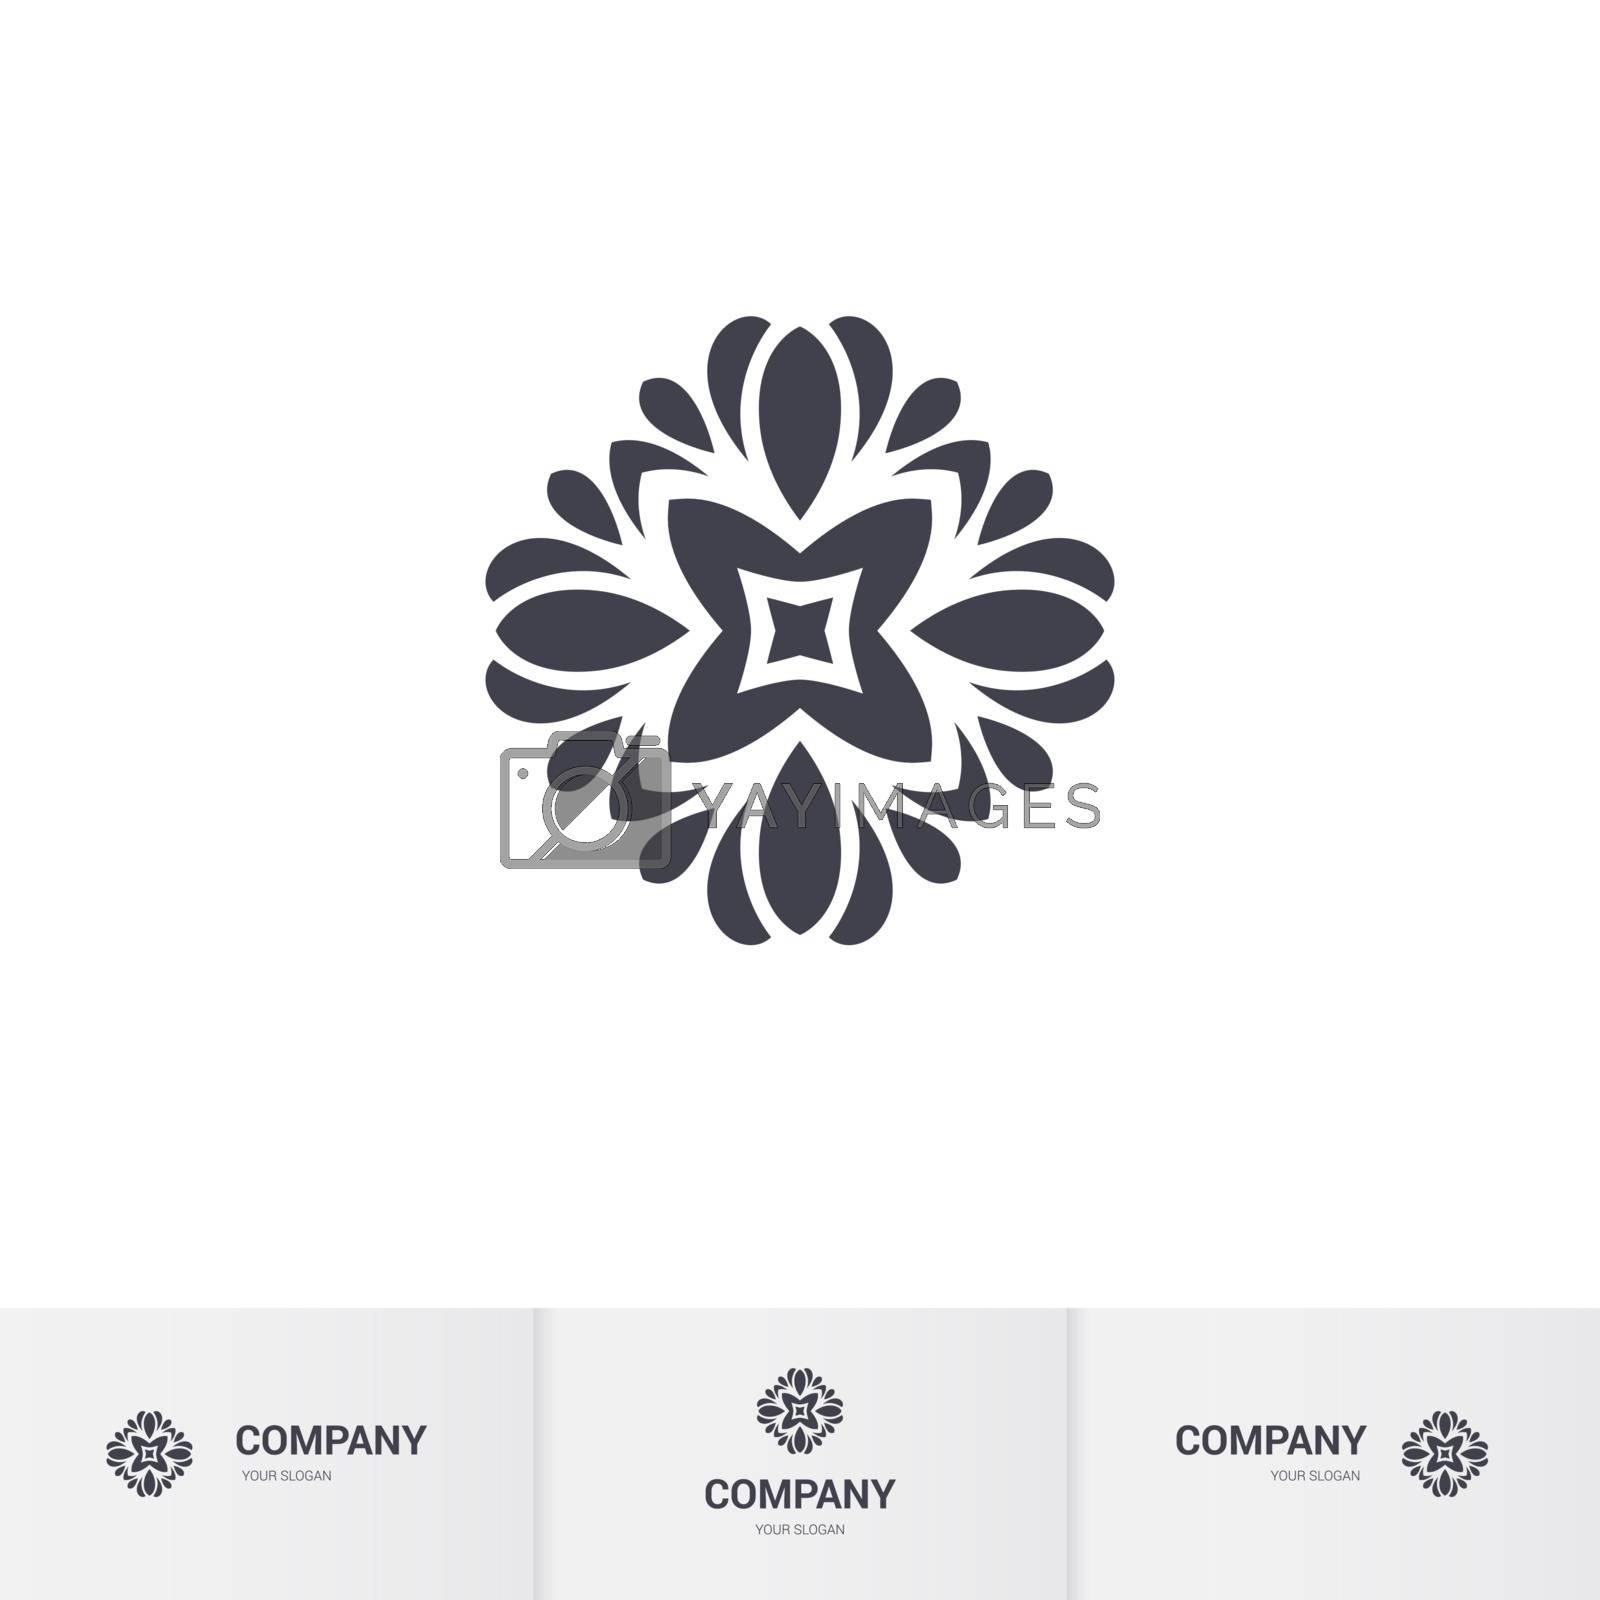 Floral Geometric Element for Circular Logo. Company Mark, Emblem, Element. Simple Geometric Mandala Logotype